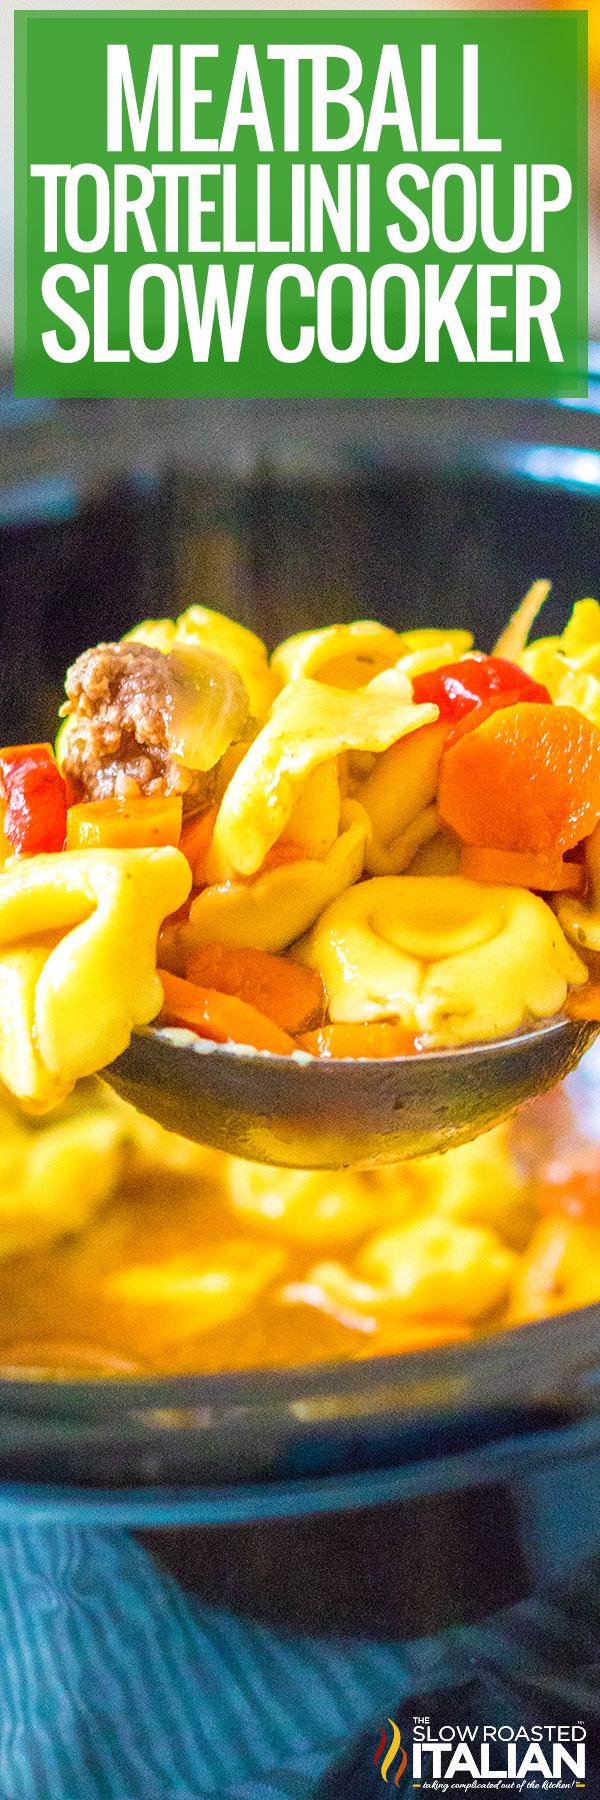 Meatball Tortellini Soup (Slow Cooker) closeup